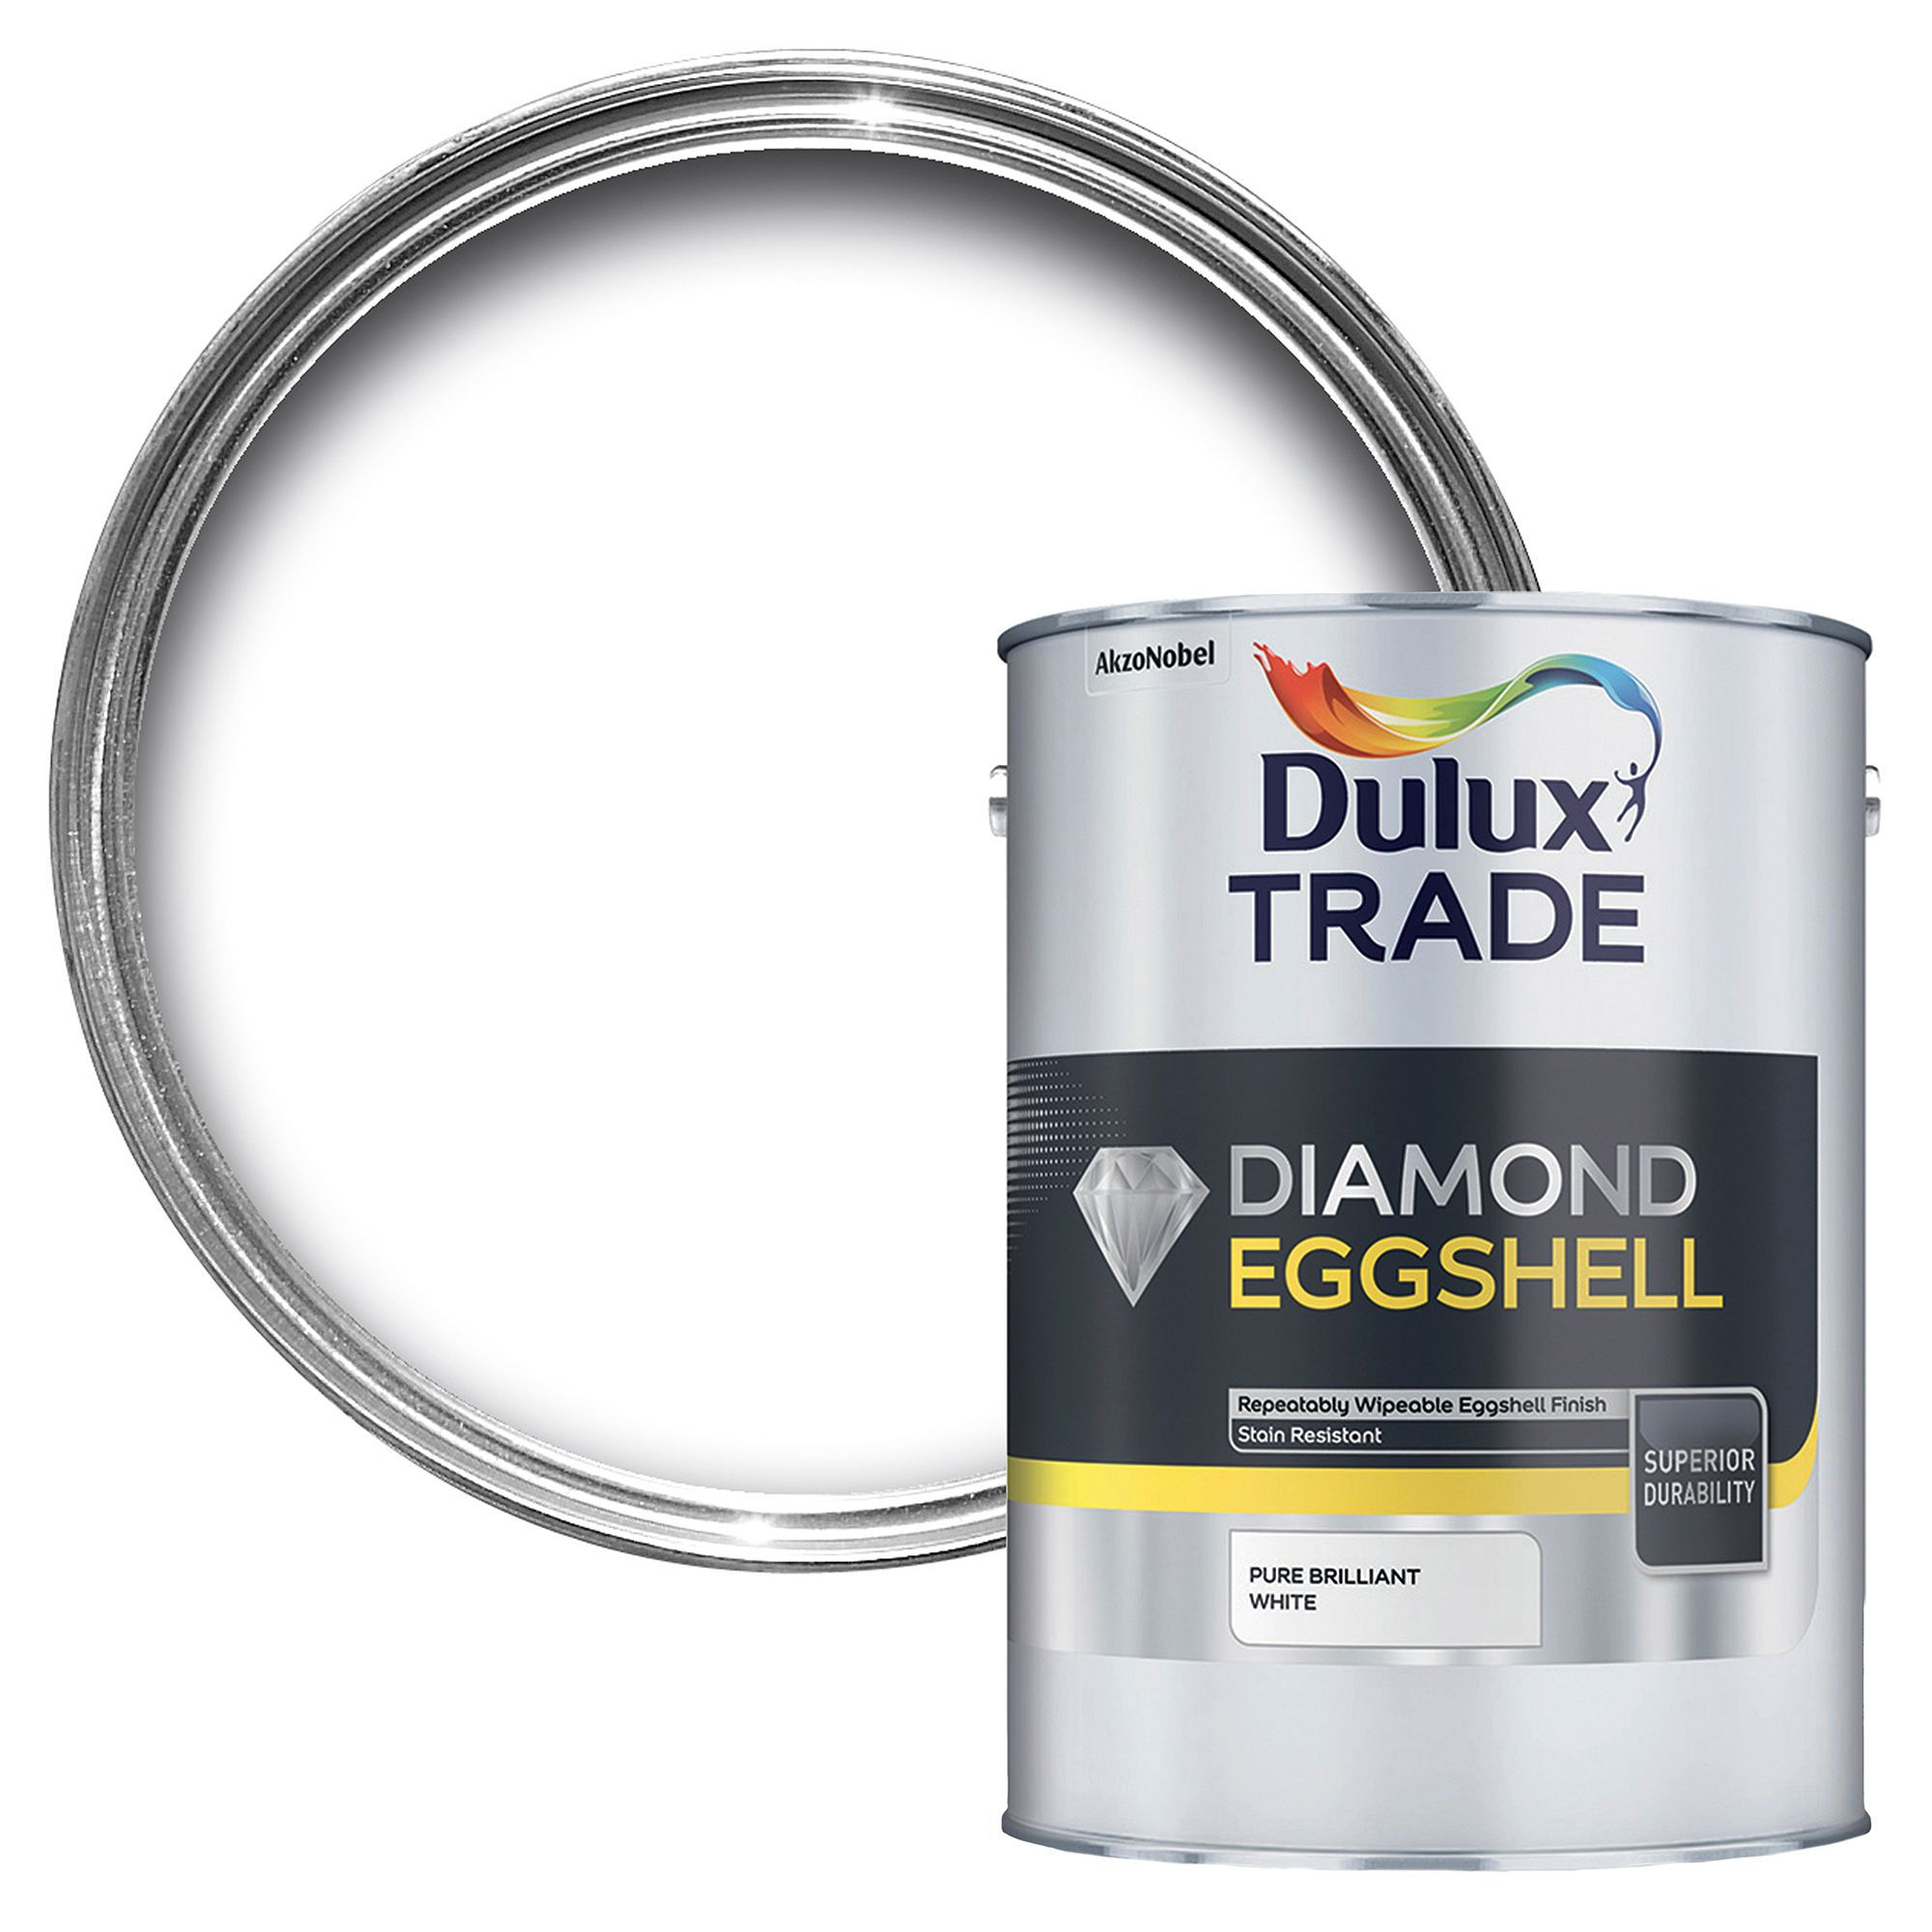 Dulux Trade Diamond Brilliant white Eggshell Wood & metal paint 2 5L |  Departments | DIY at B&Q